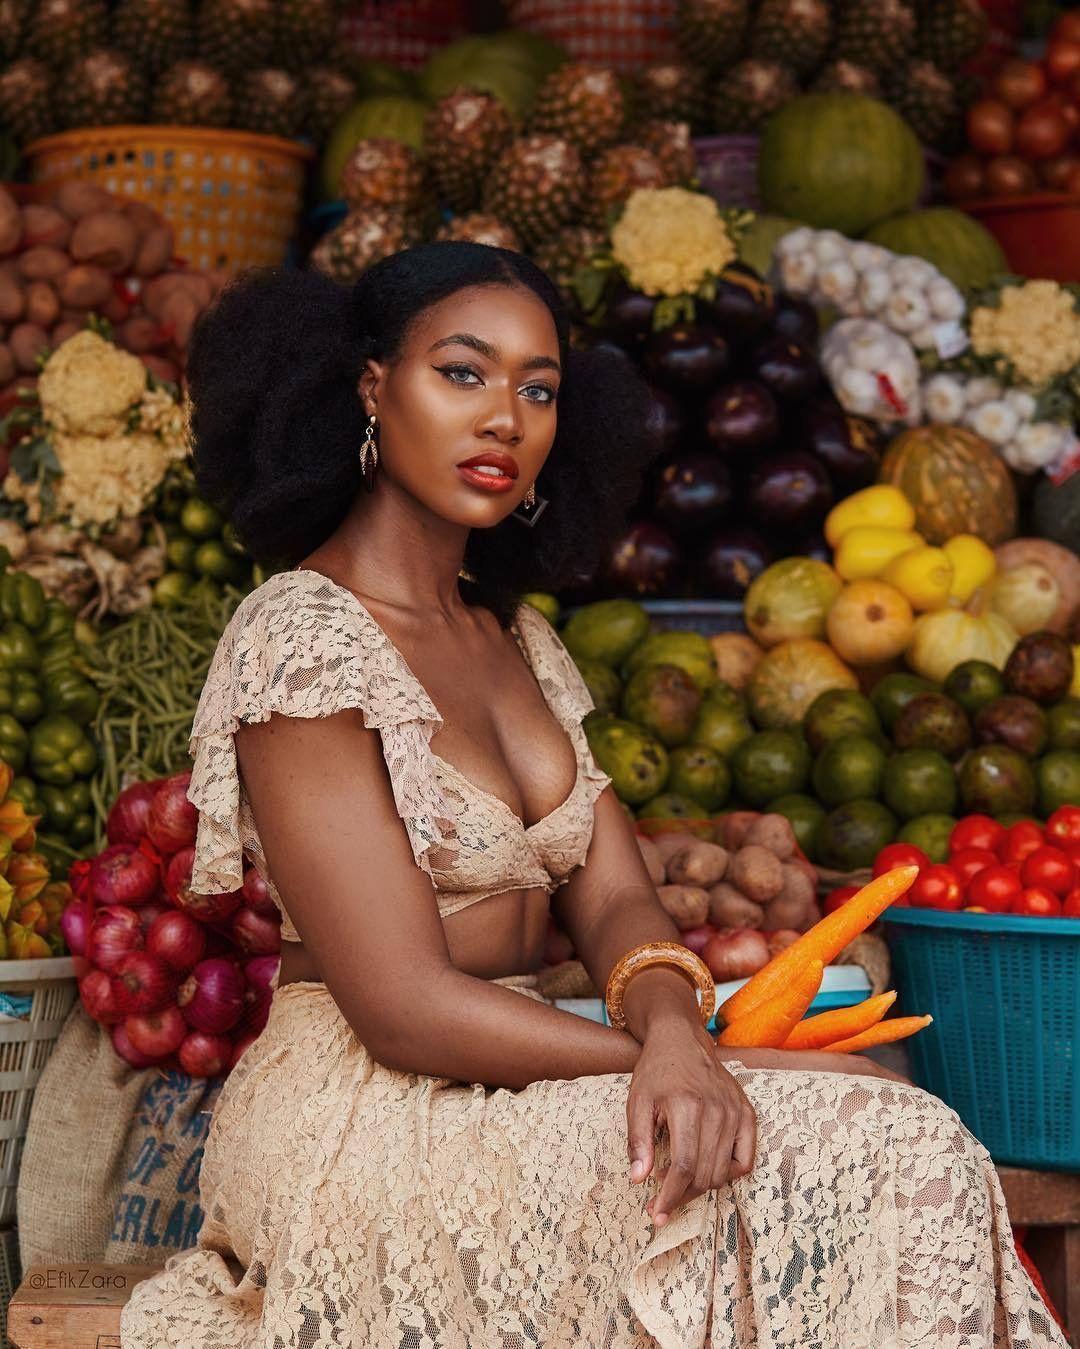 Pin by lima gqomfa on Photography  Pinterest  Black girls Black